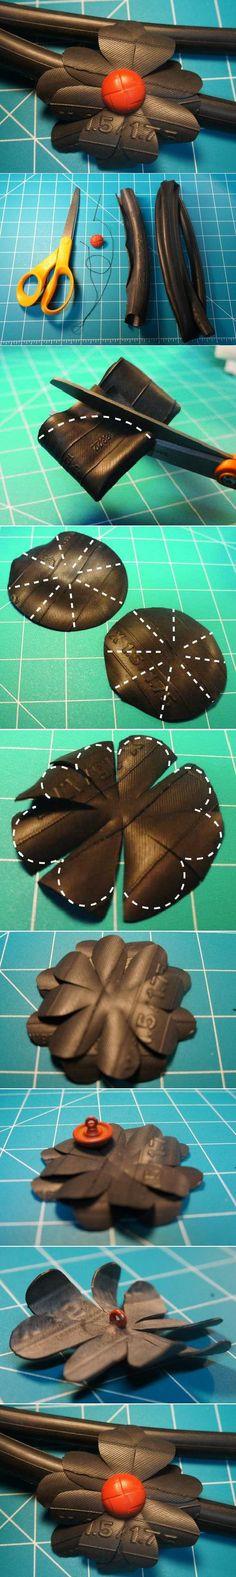 DIY Rubber Tire Flower